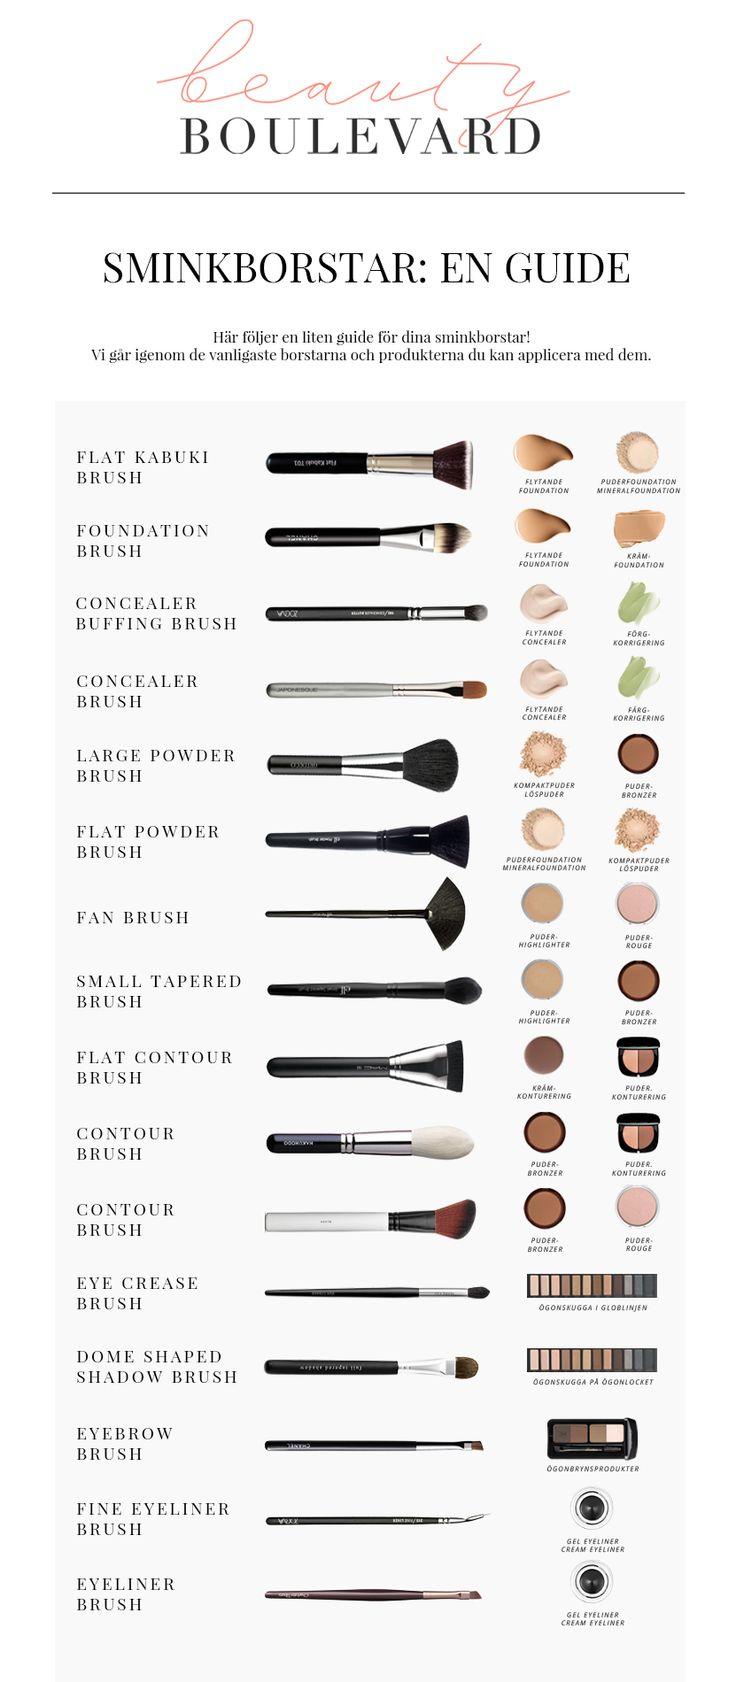 Sminkborstar ♥ En Guide http://beautyboulevard.se/sminkborstar-en-guide/ Makeup Brush Guide Brushes Borstar Smink Skönhet Makeup Eyeshadow Ögonskugga Rouge Blush Powder Puder